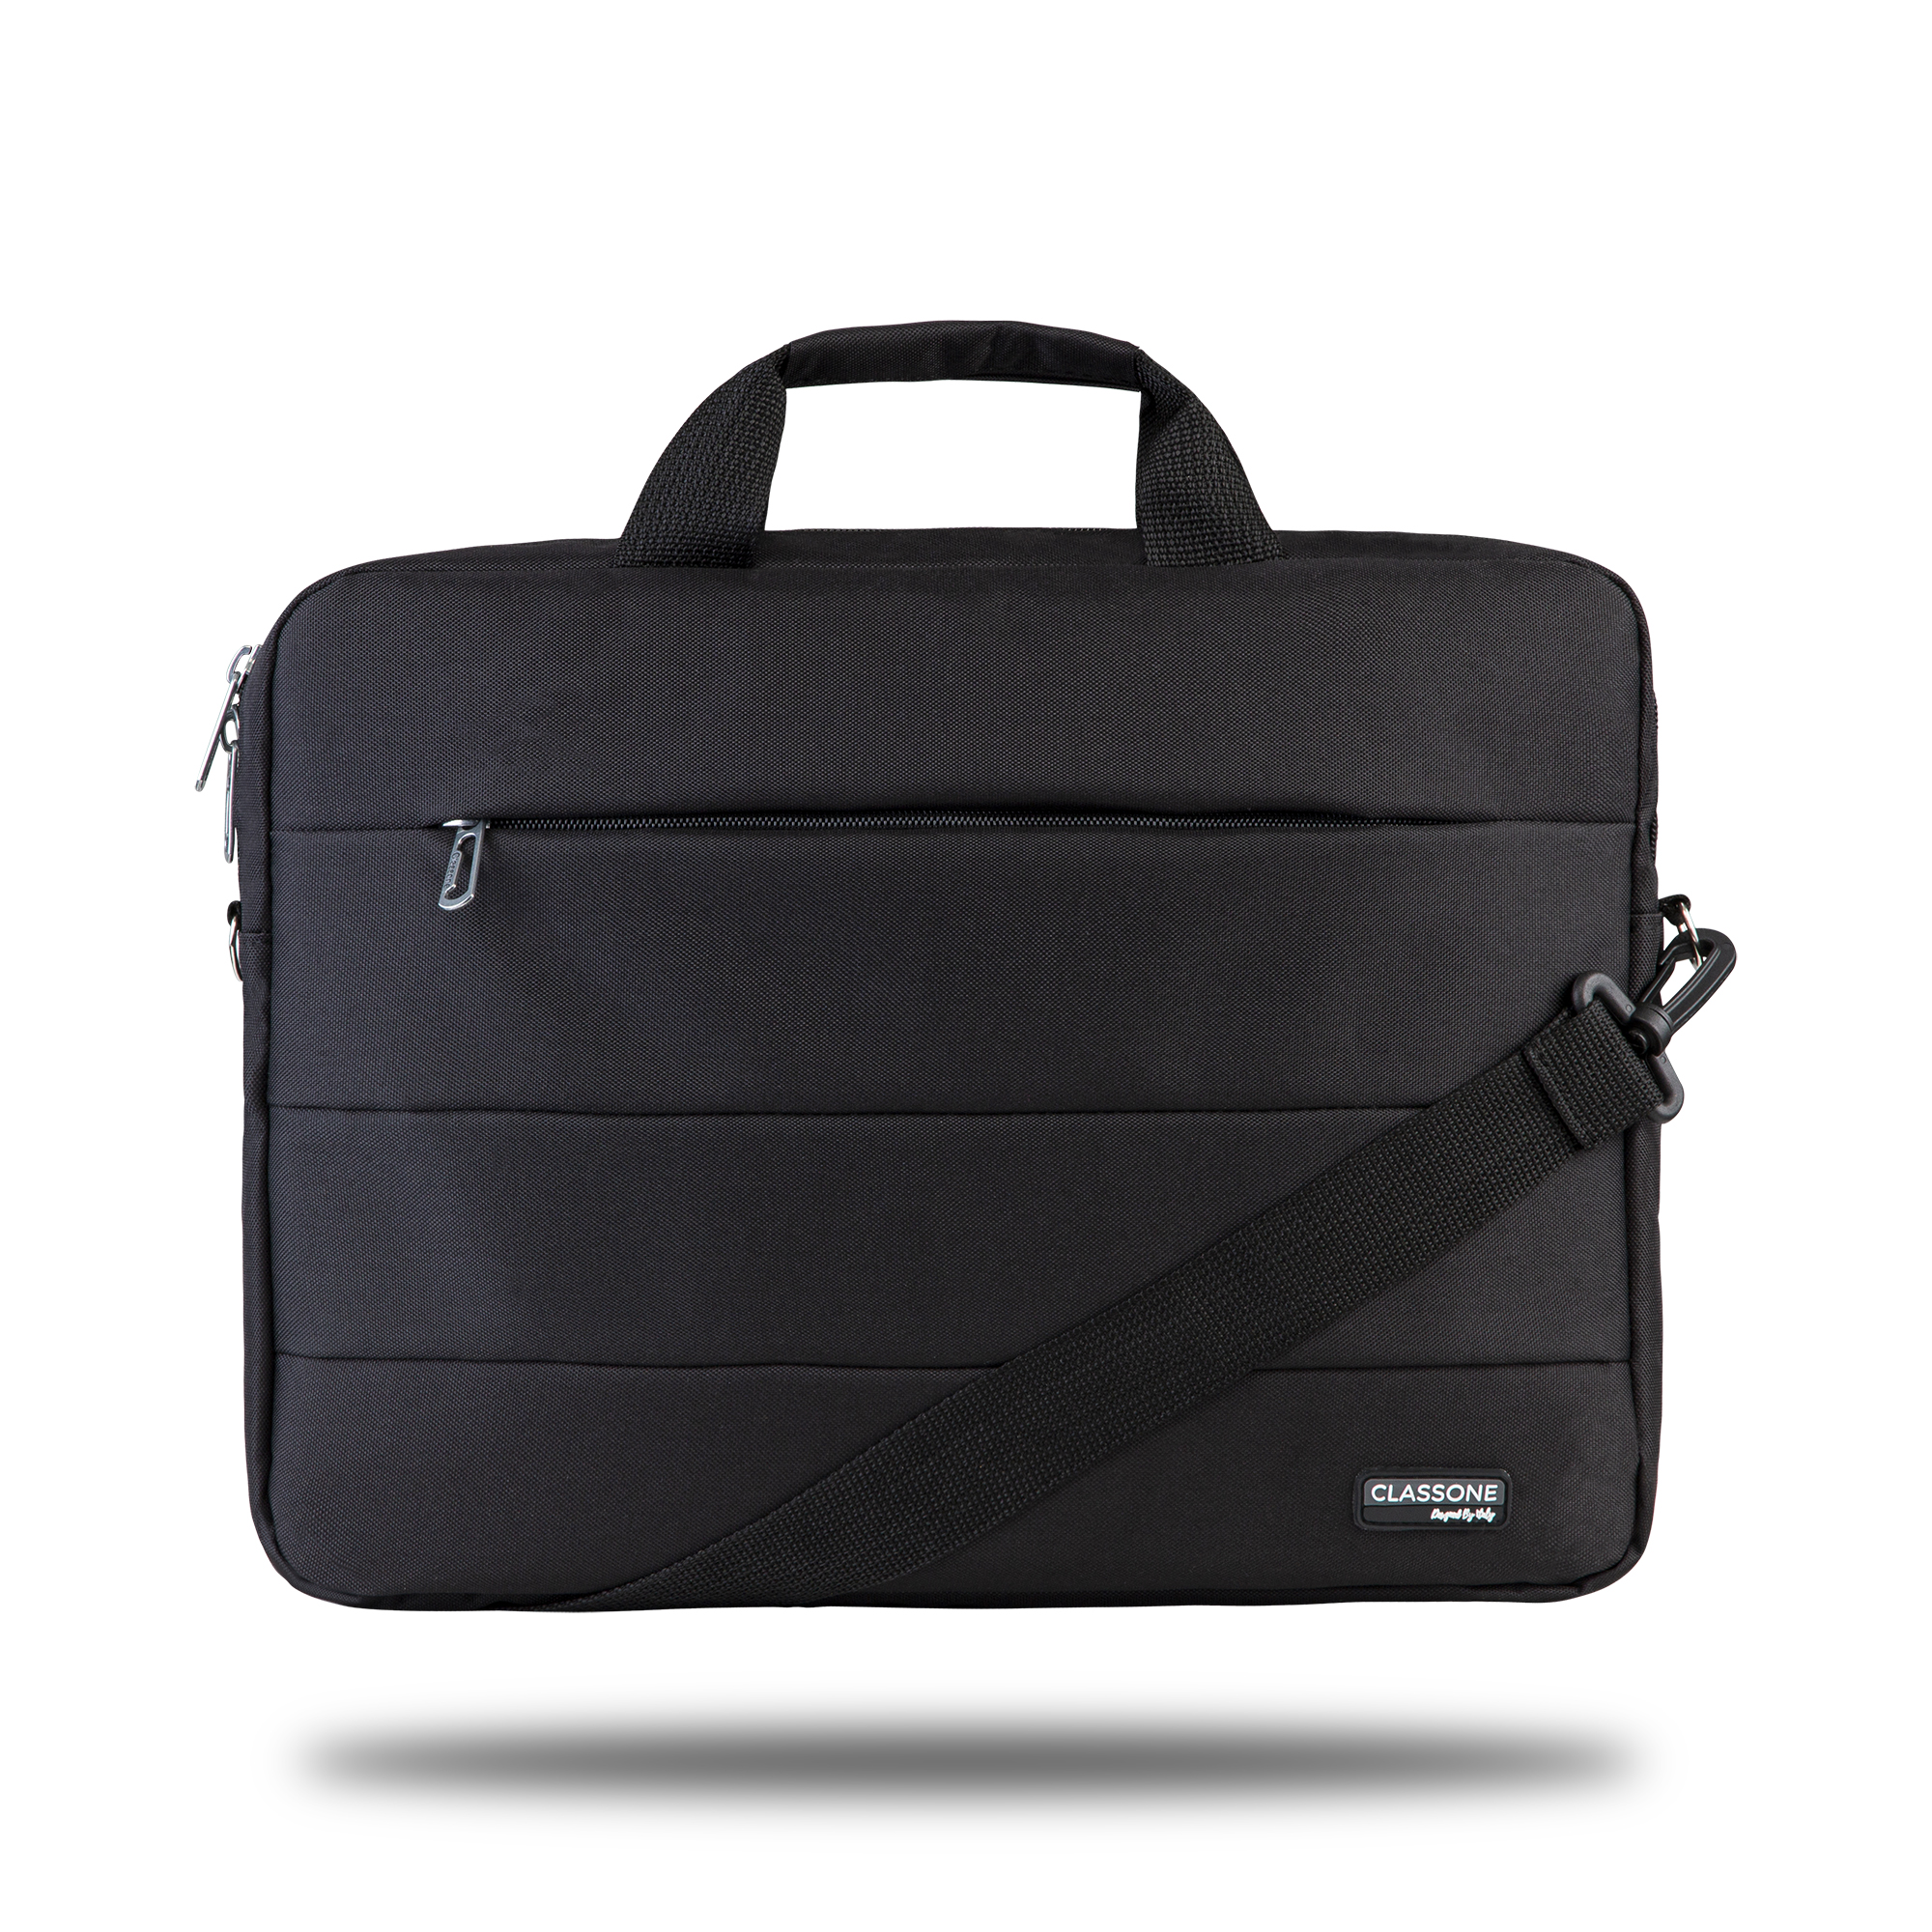 Classone Romeo Large Serisi TL2000 15.6 inch Uyumlu Notebook Çantası – Siyah